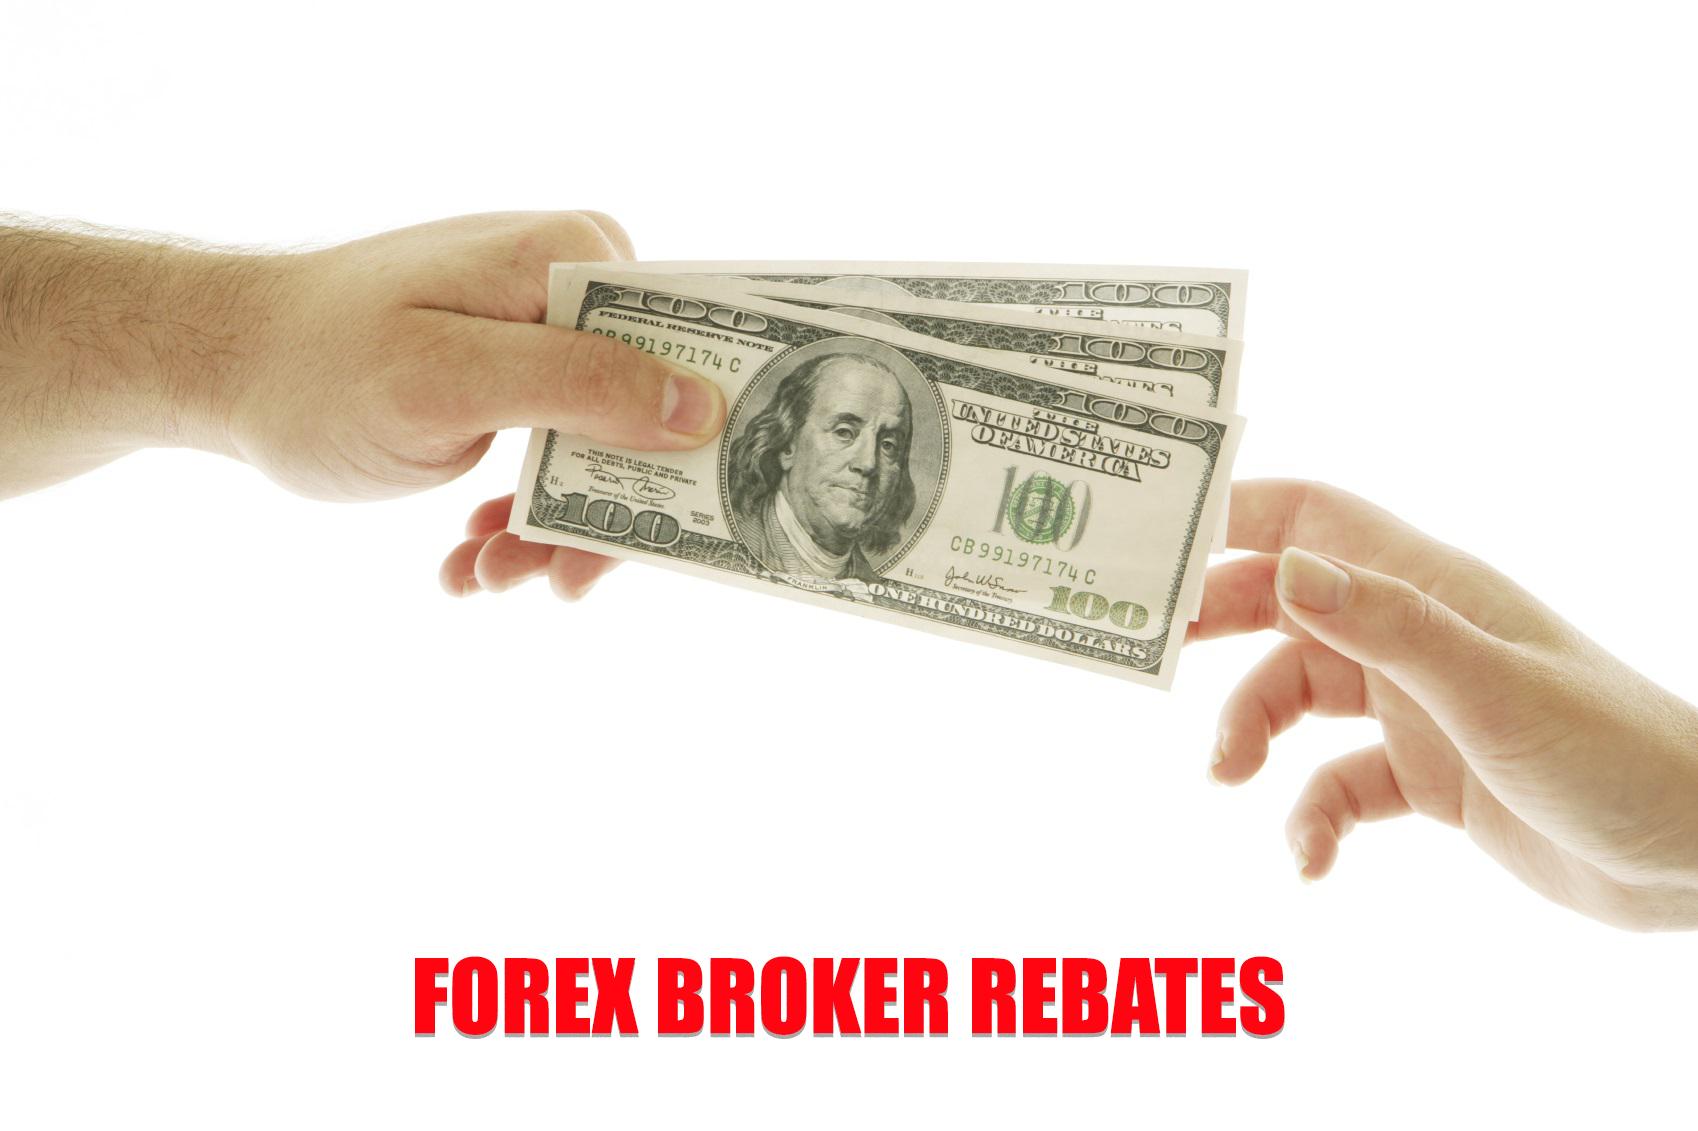 Forex rebates review